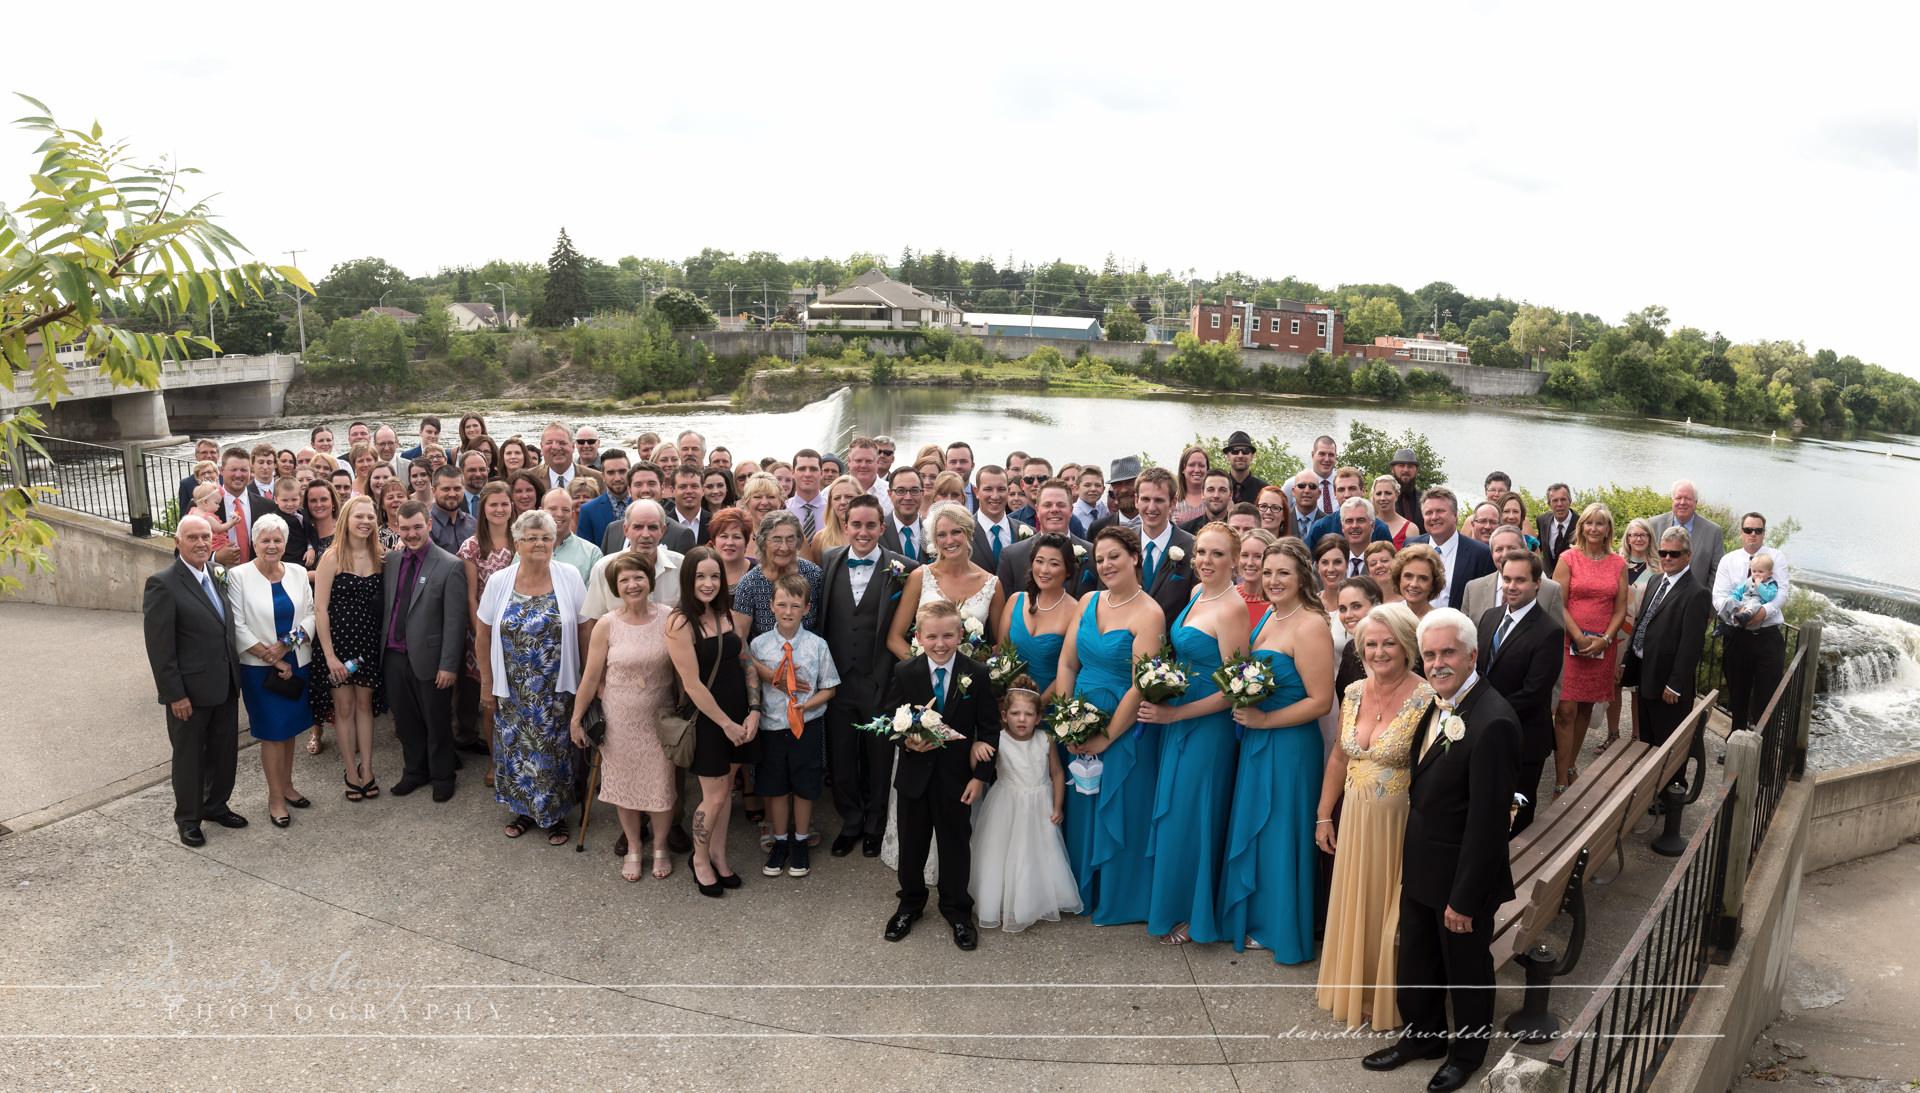 cambridge-mill-wedding-david-sherry-photography-18